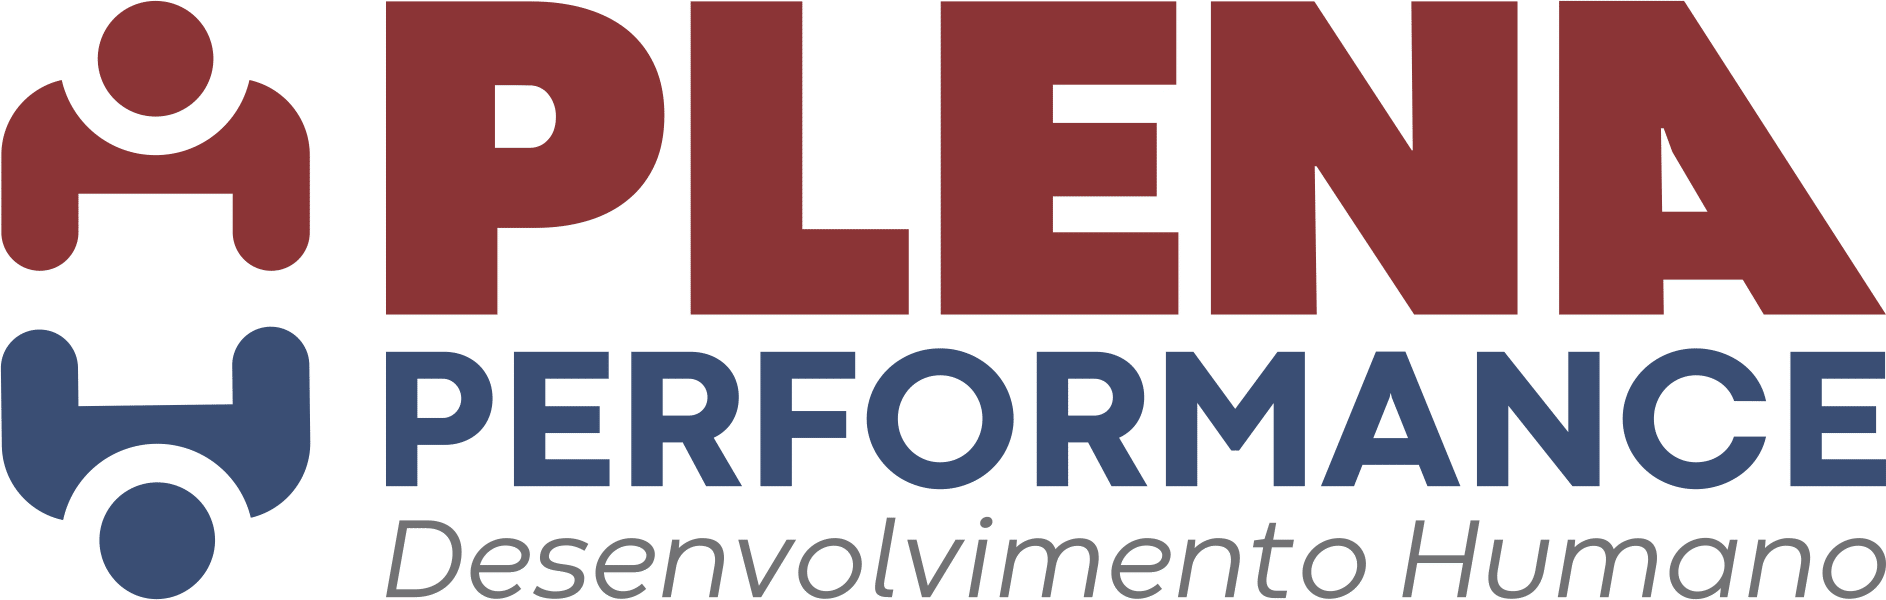 Plena Performance